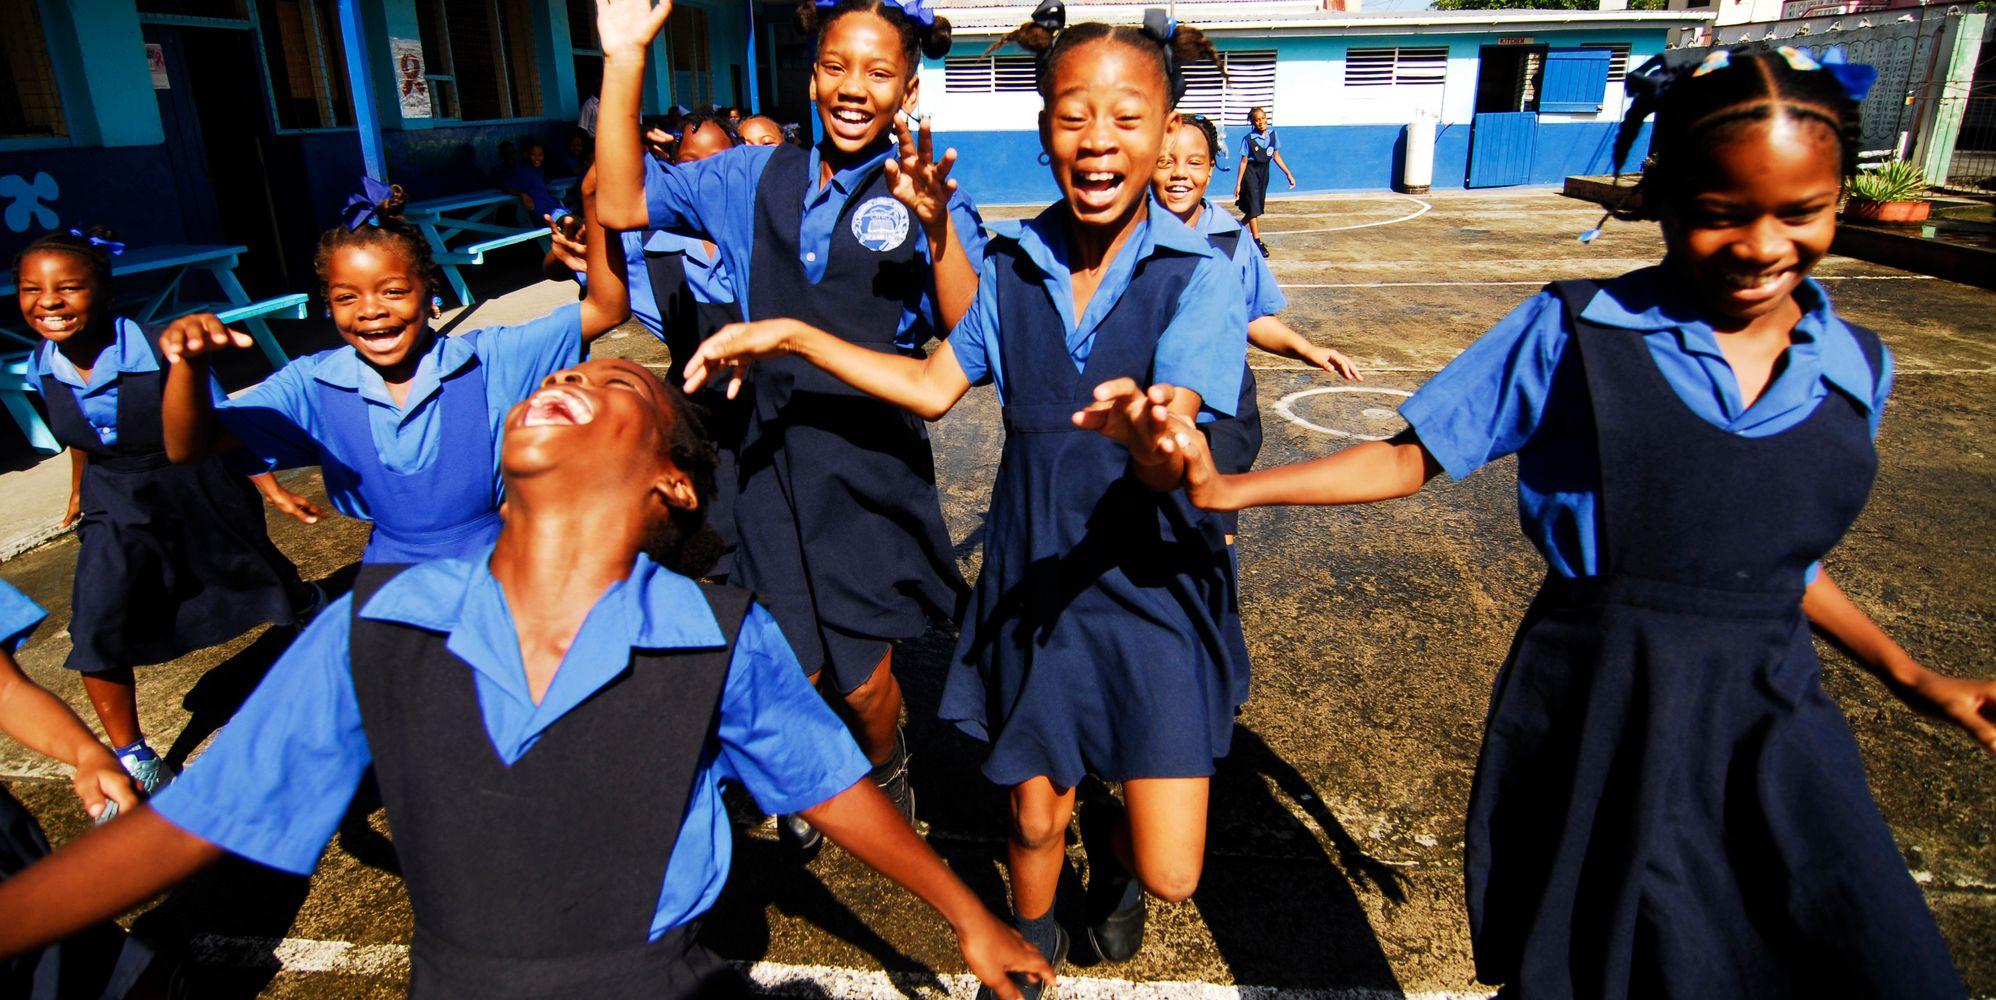 50 Infectious Photos Of Girls Looking Joyful Around The World